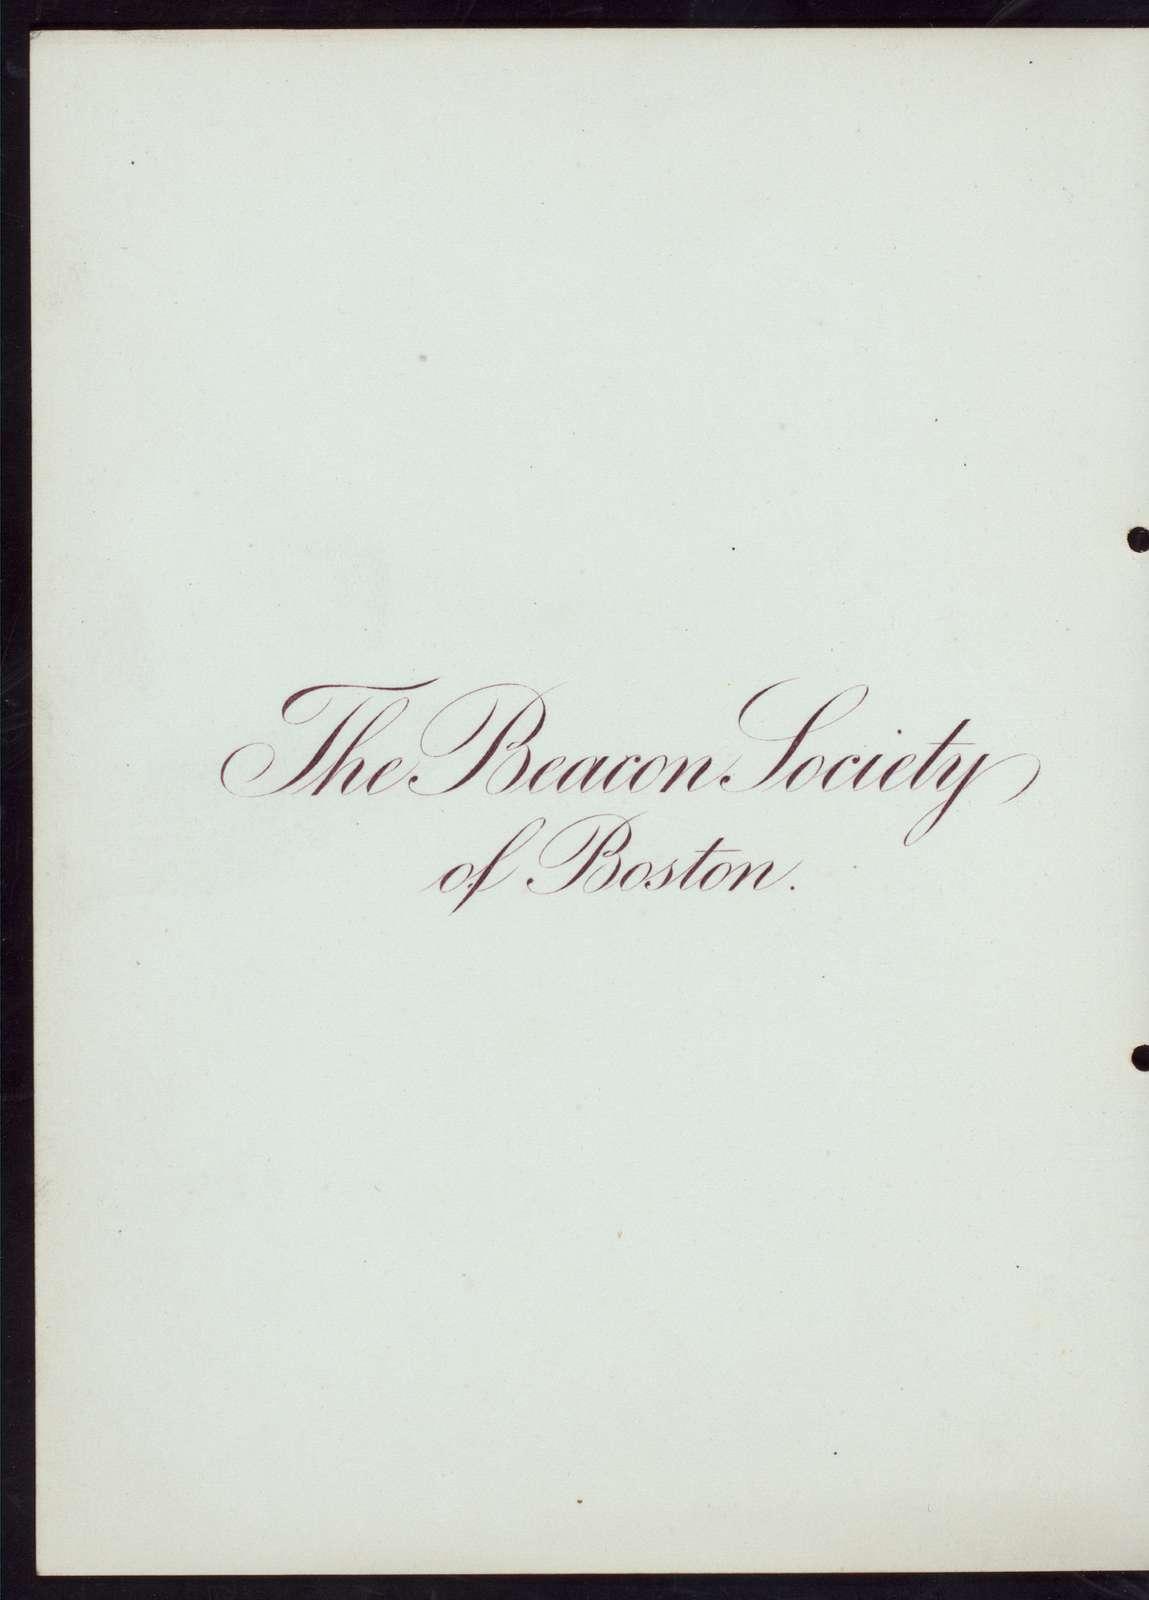 LADIES NIGHT [held by] THE BEACON SOCIETY OF BOSTON [at] HOTEL BRUNSWICK (HOTEL)